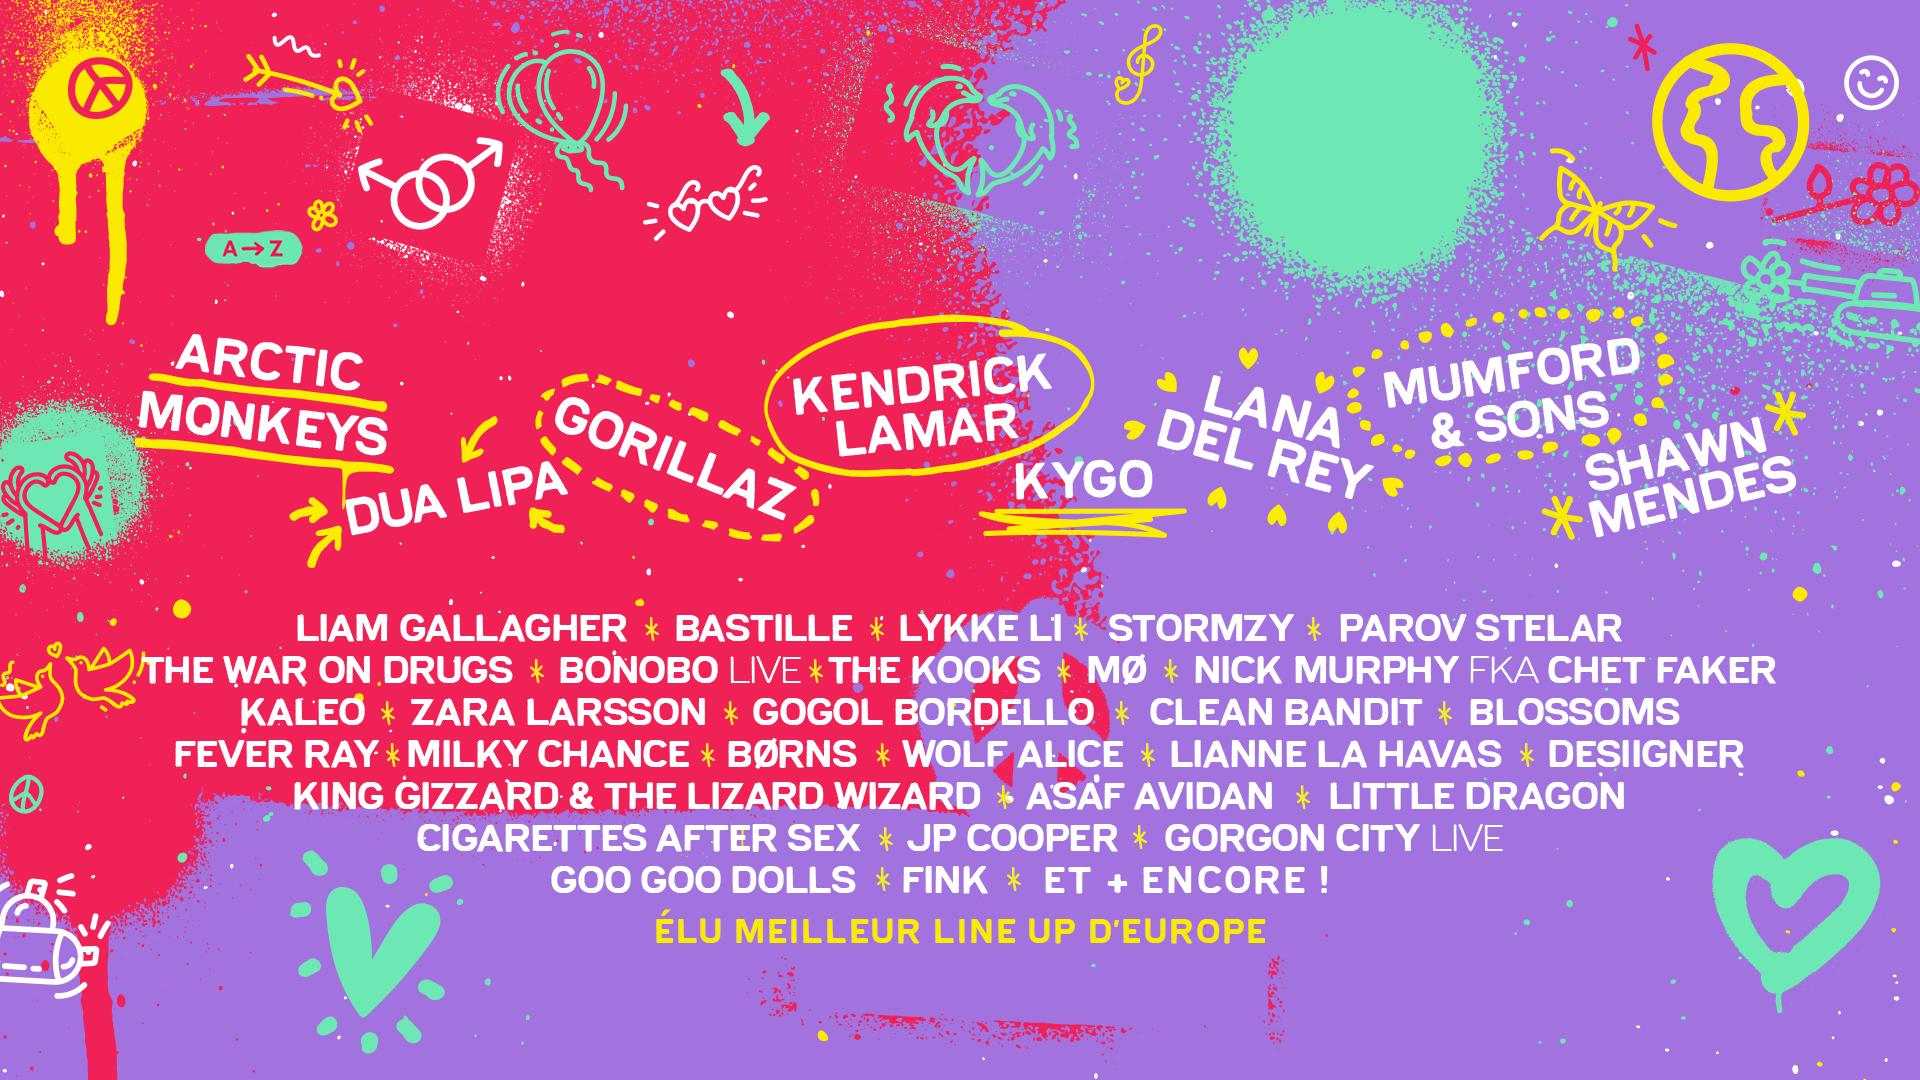 sziget-festival-line-up-2018-complet